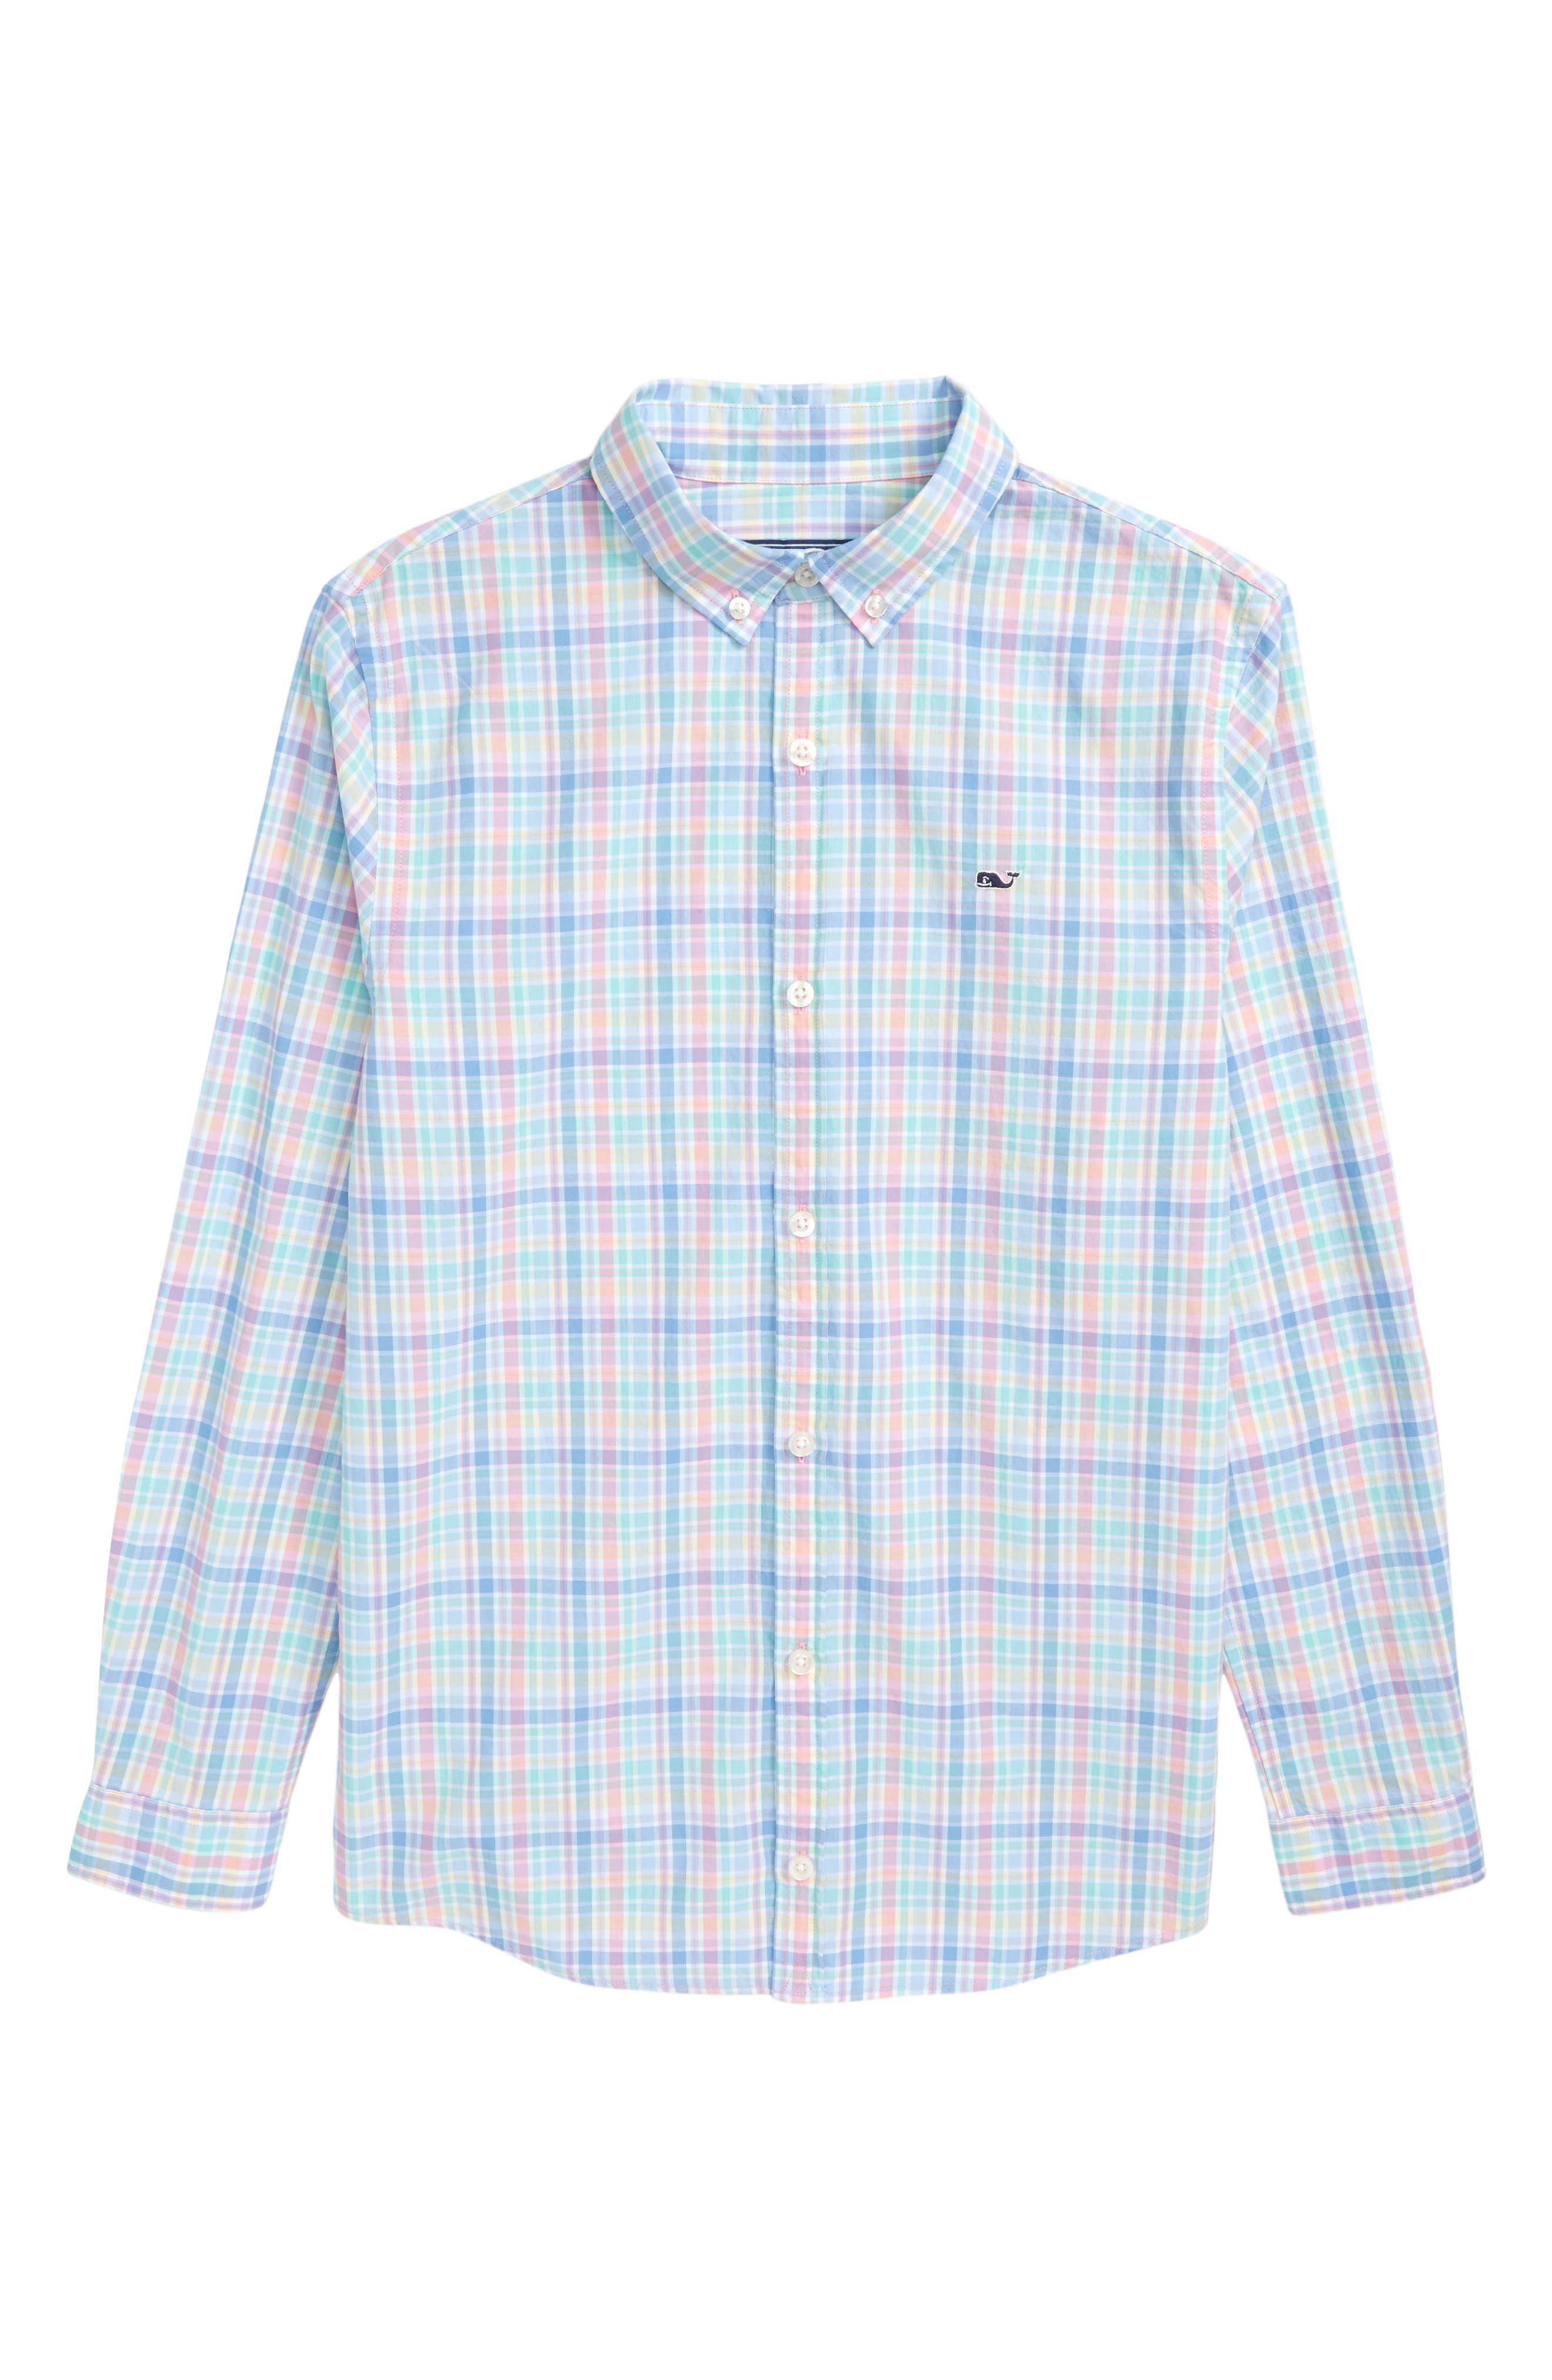 Walkers Cay Plaid Woven Shirt,                             Main thumbnail 1, color,                             Jake Blue